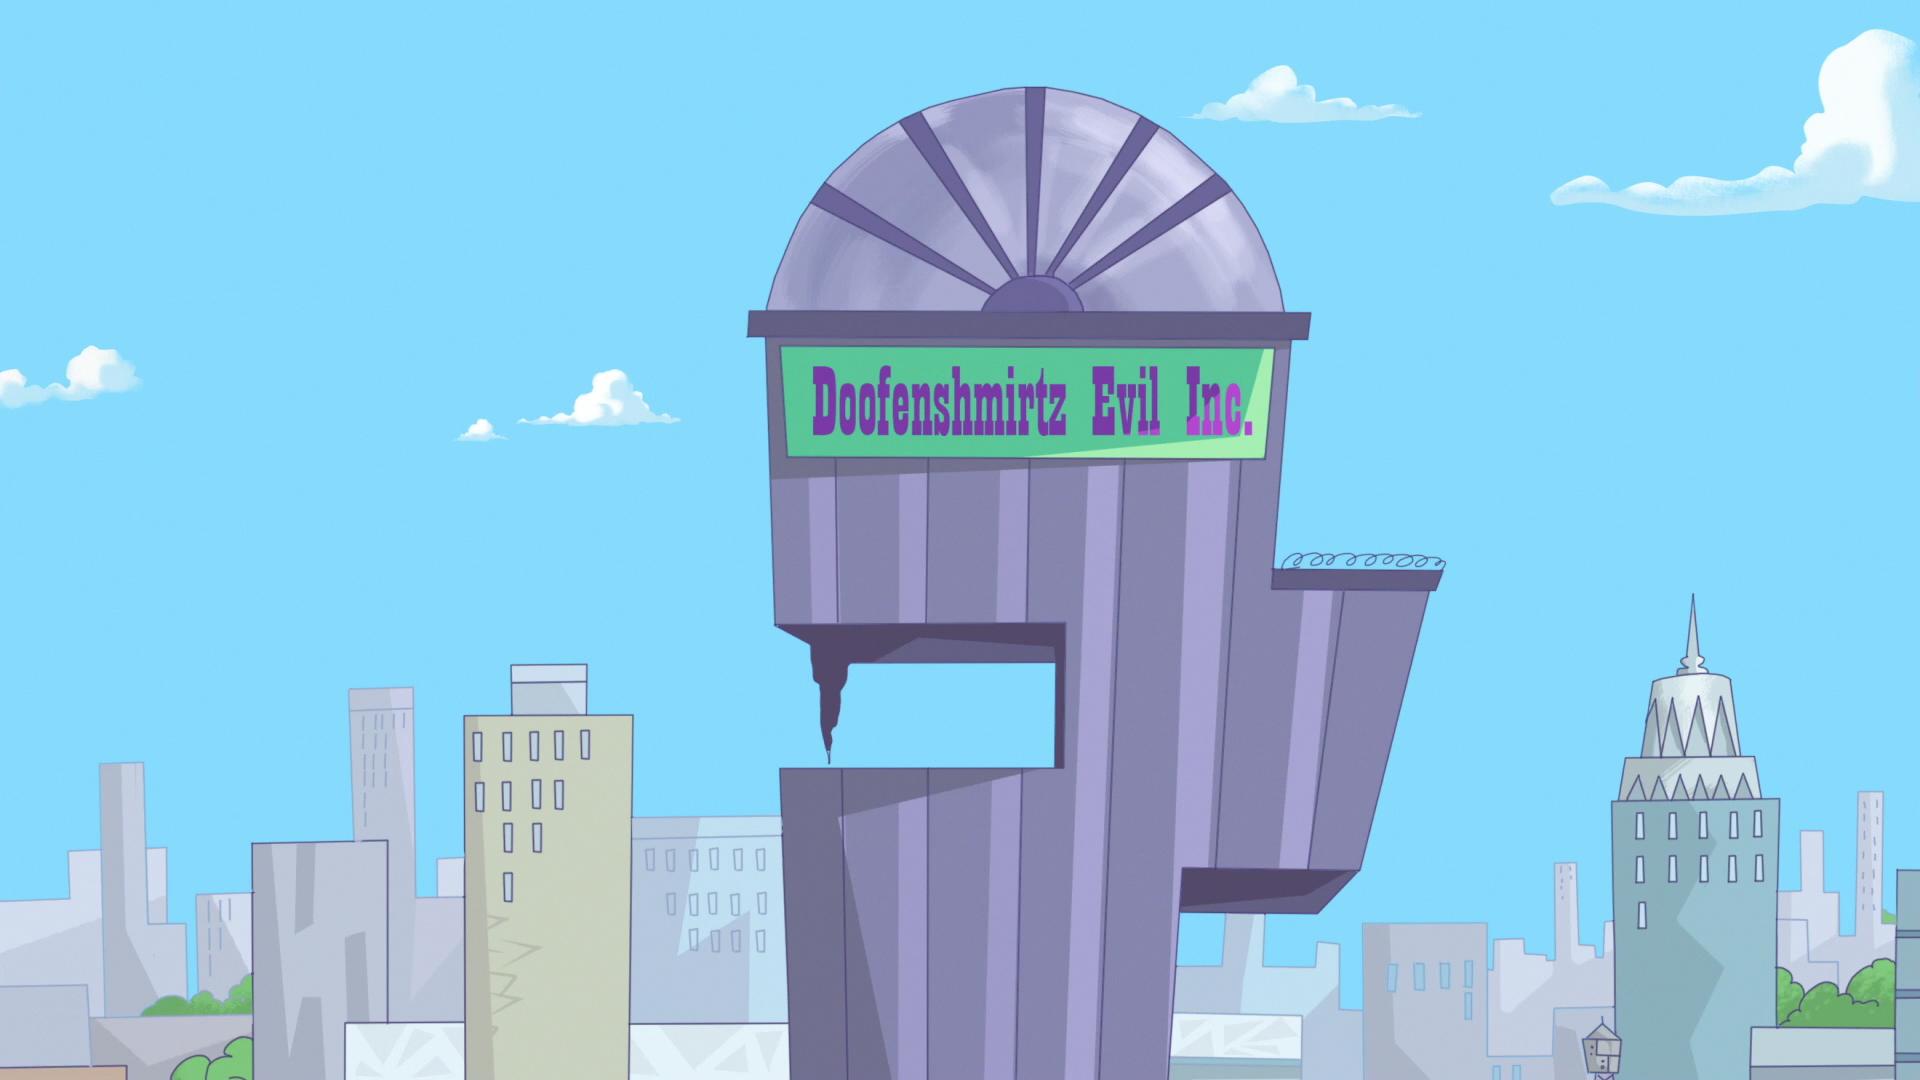 doofenshmirtz evil incorporated phineas and ferb wiki fandom